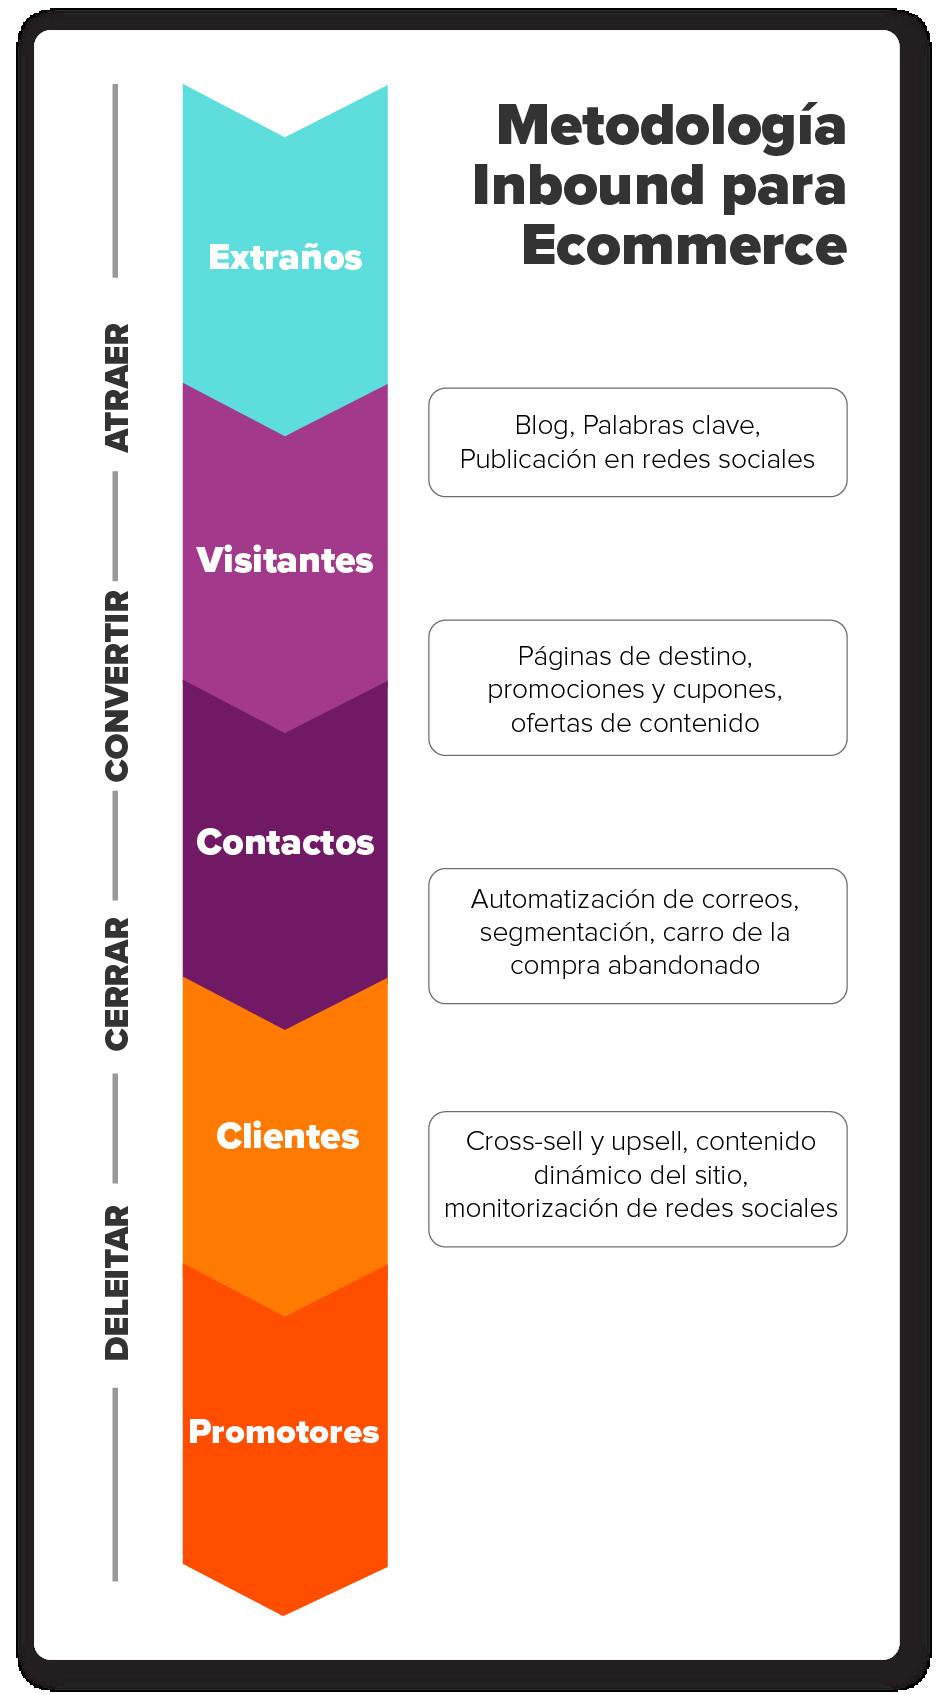 metodologia-inbound-para-ecommerce